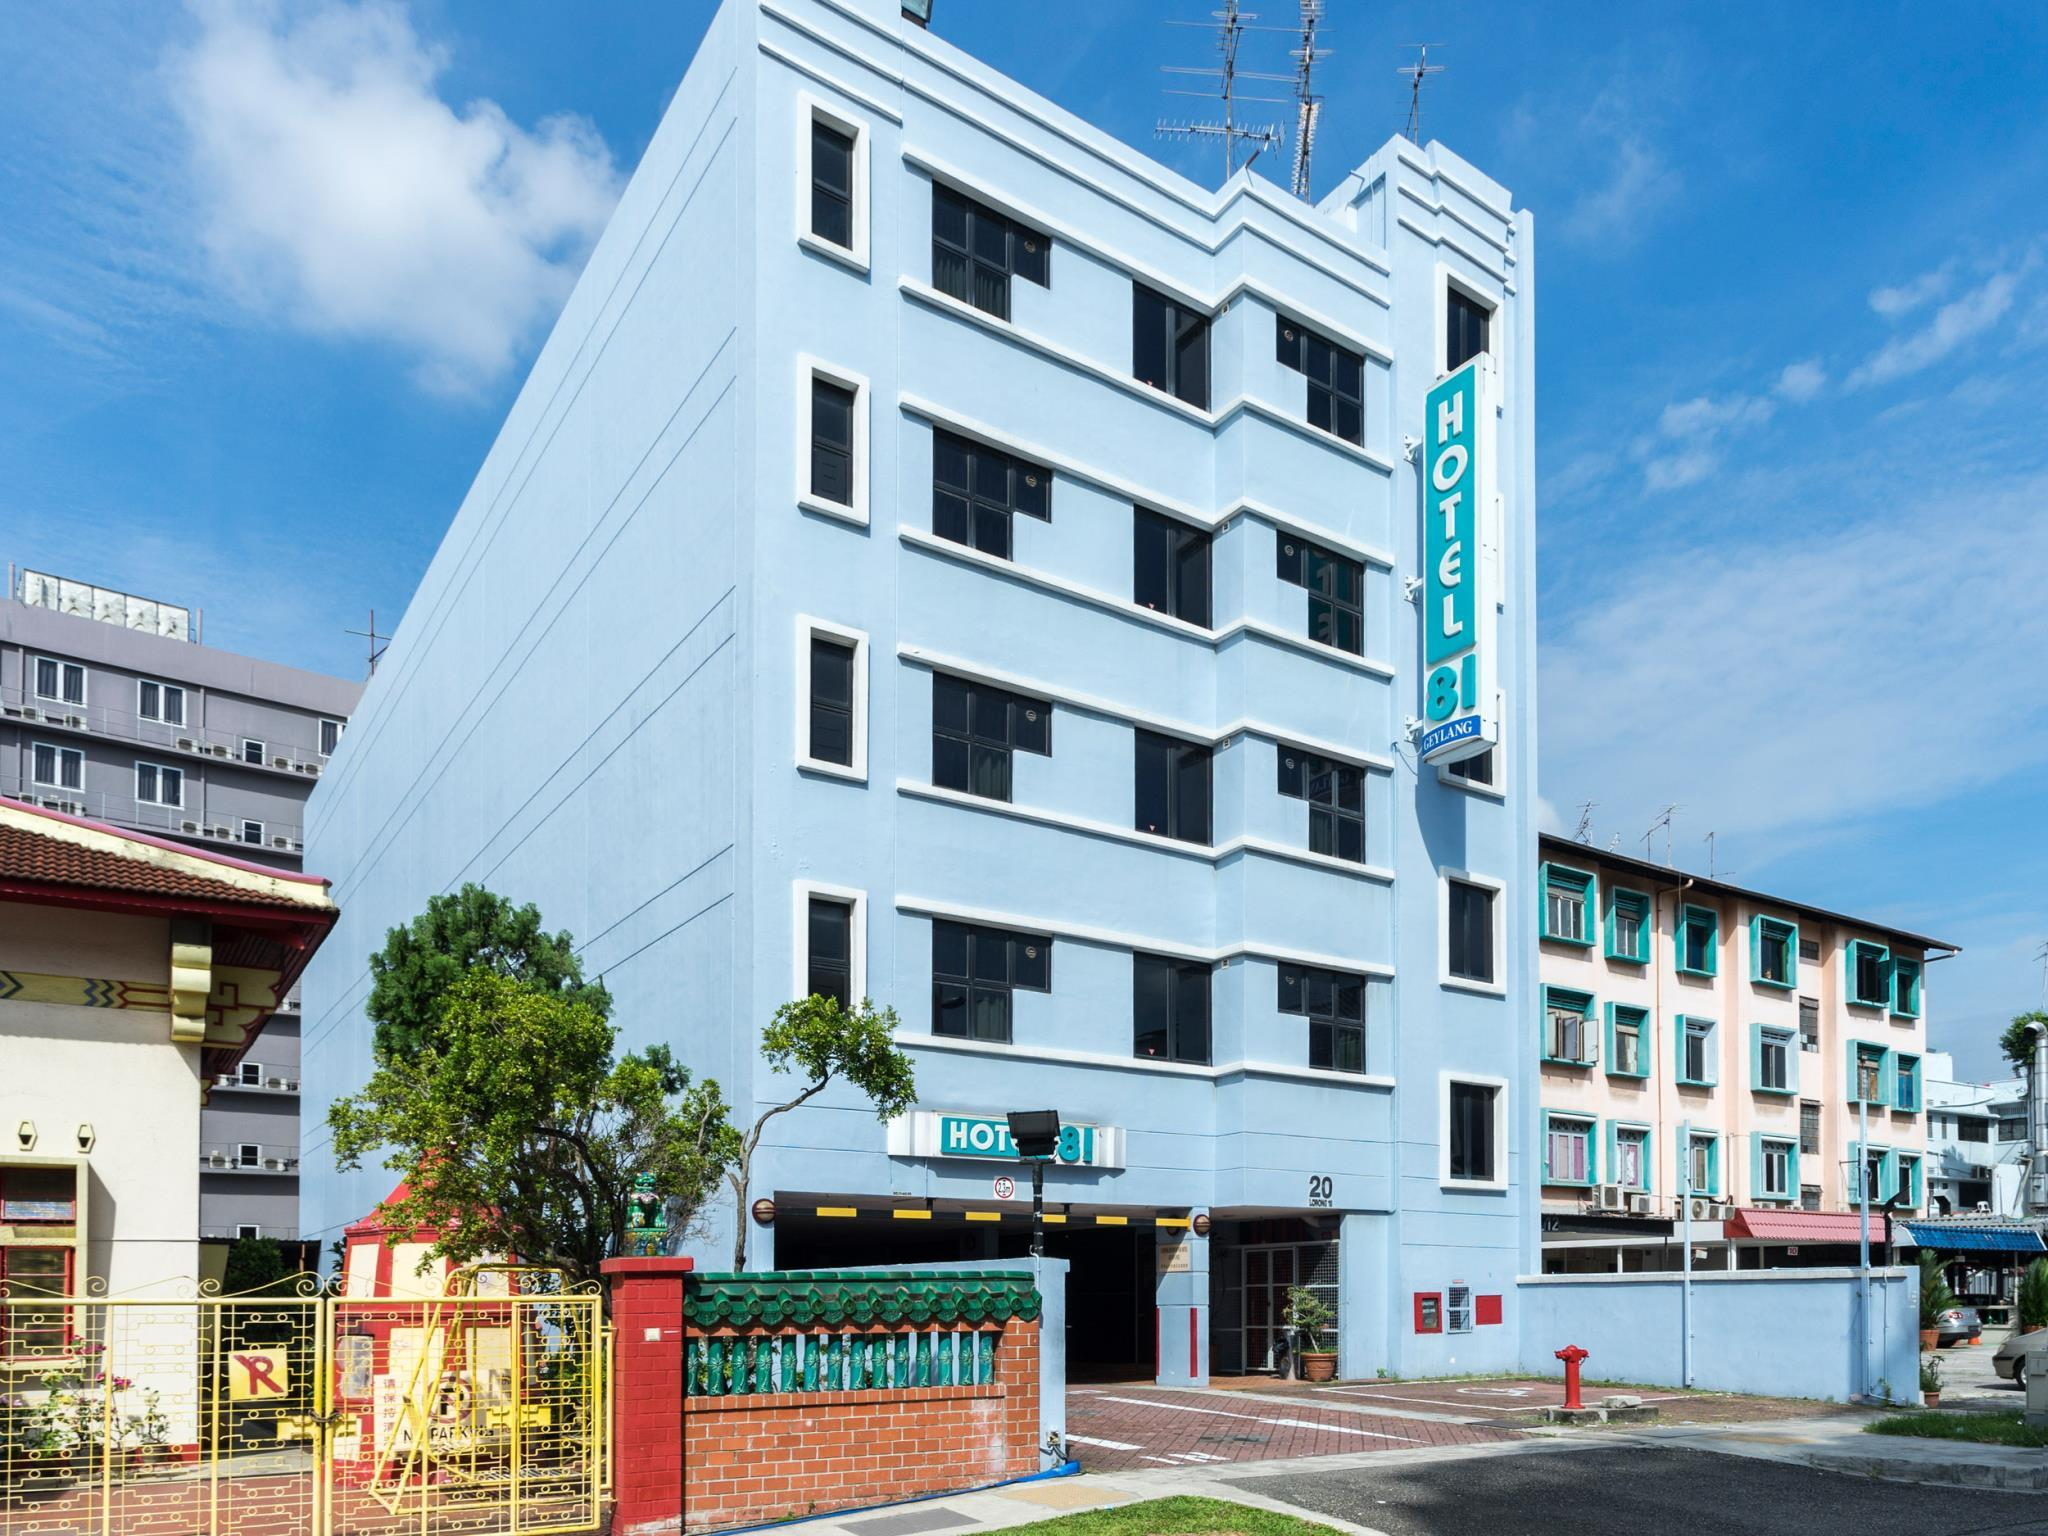 Best Price on Hotel 81 Geylang in Singapore + Reviews